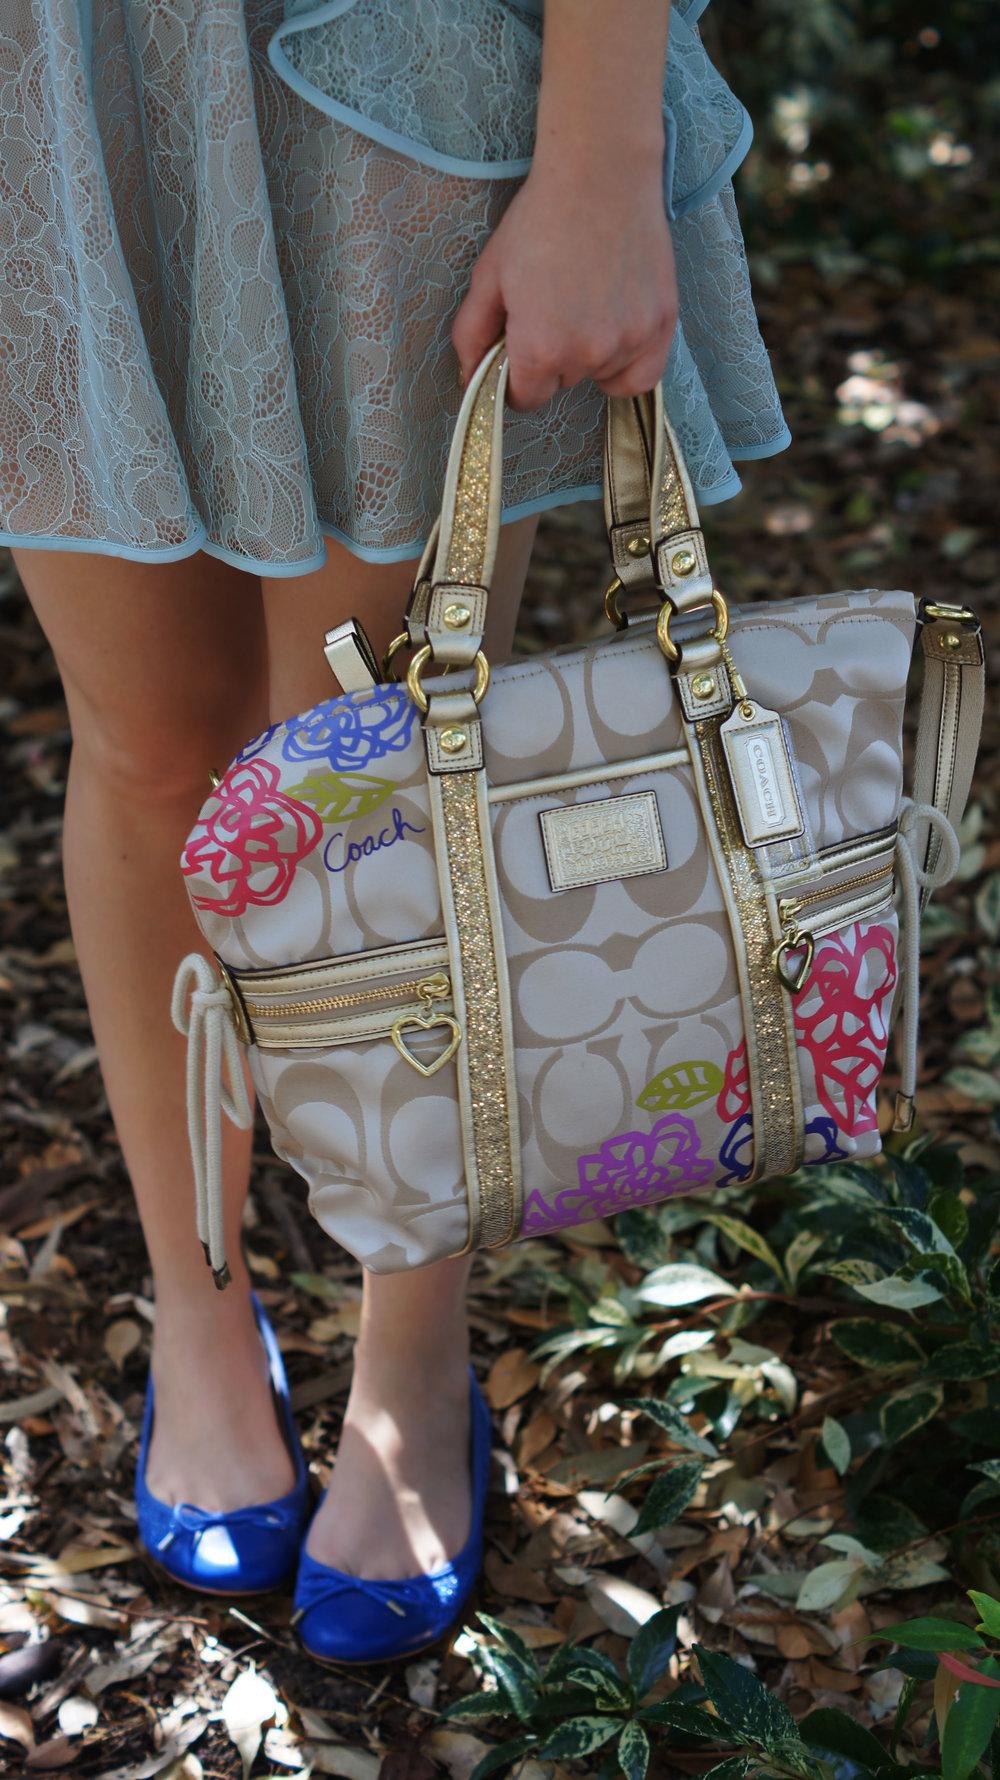 Gold&FloralCoachBag_Noskam.jpg